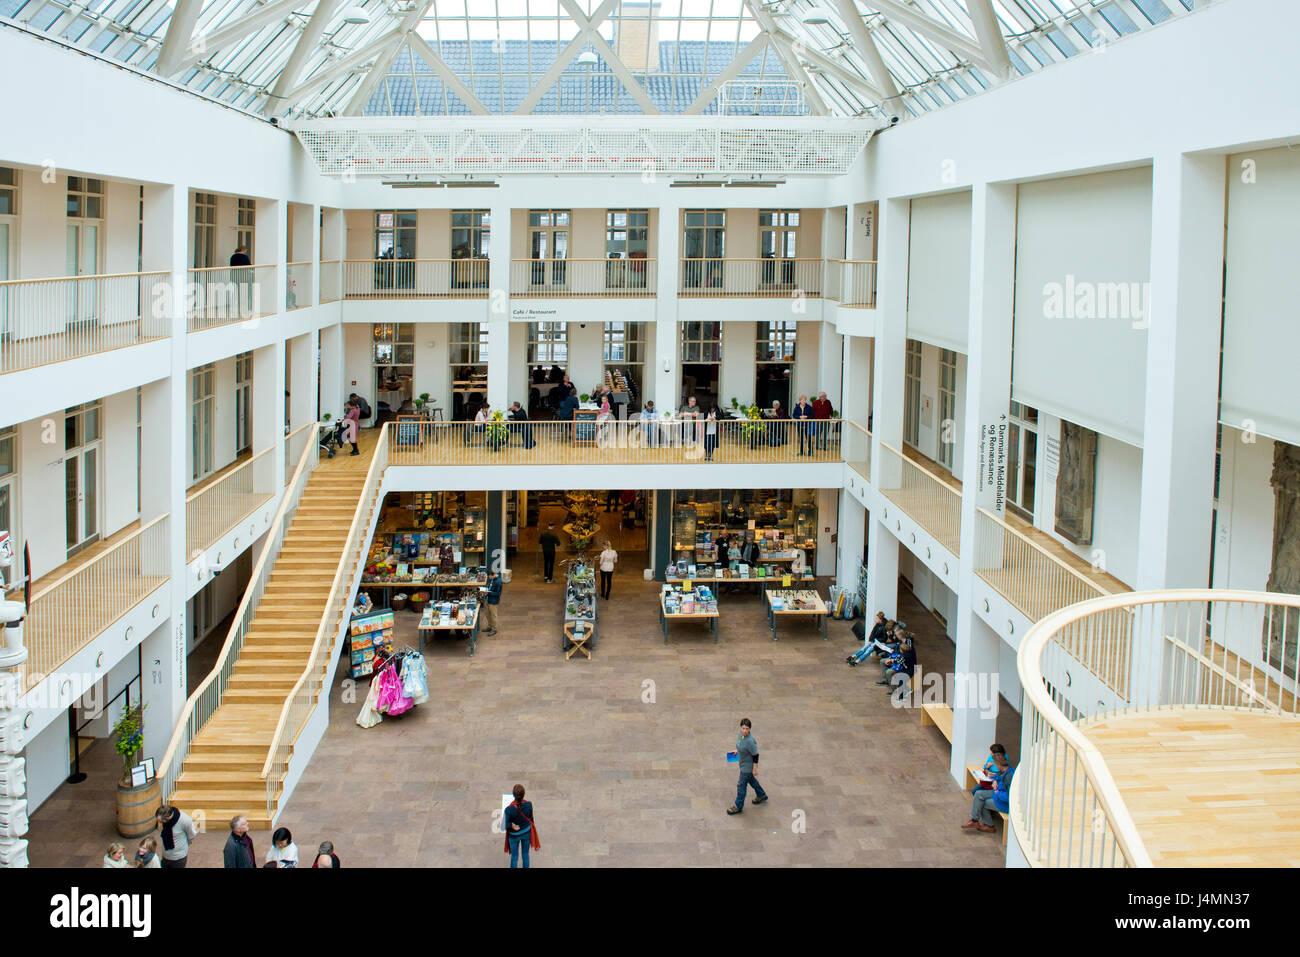 Museo nazionale di Danimarca, Copenhagen, Danimarca Foto Stock